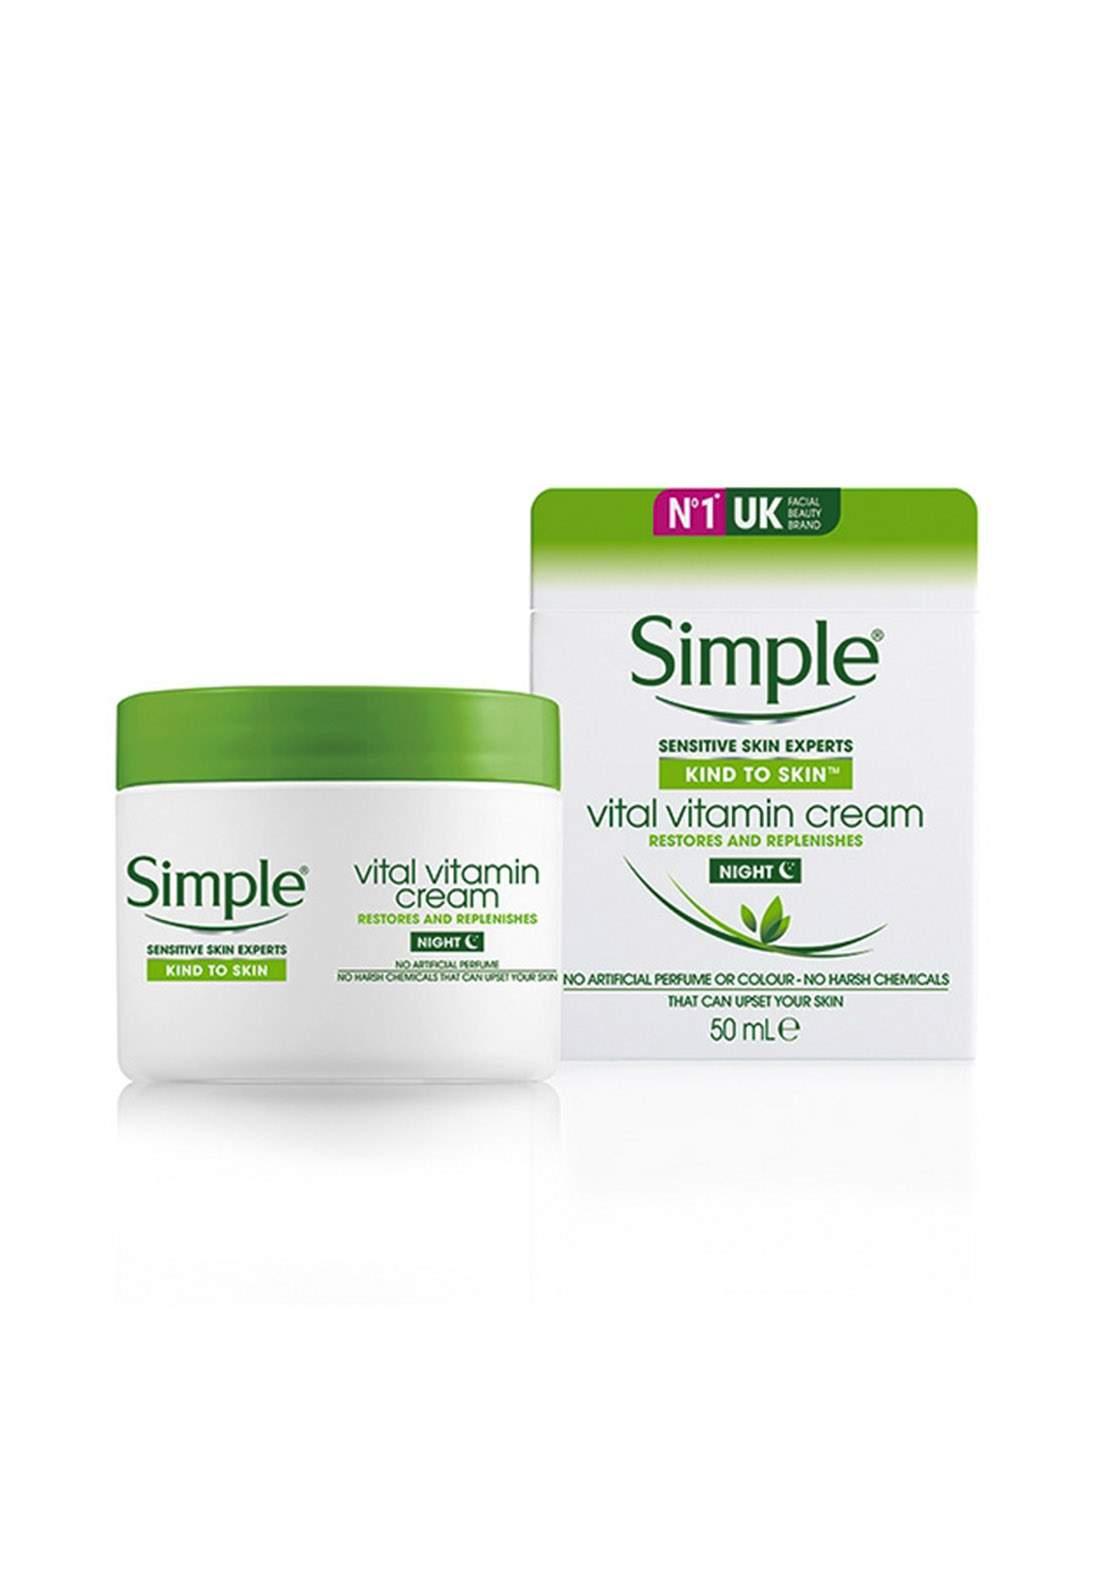 Simple (719321b) Kind To Skin Vital Vitamin Night Cream 50ml كريم ليلي